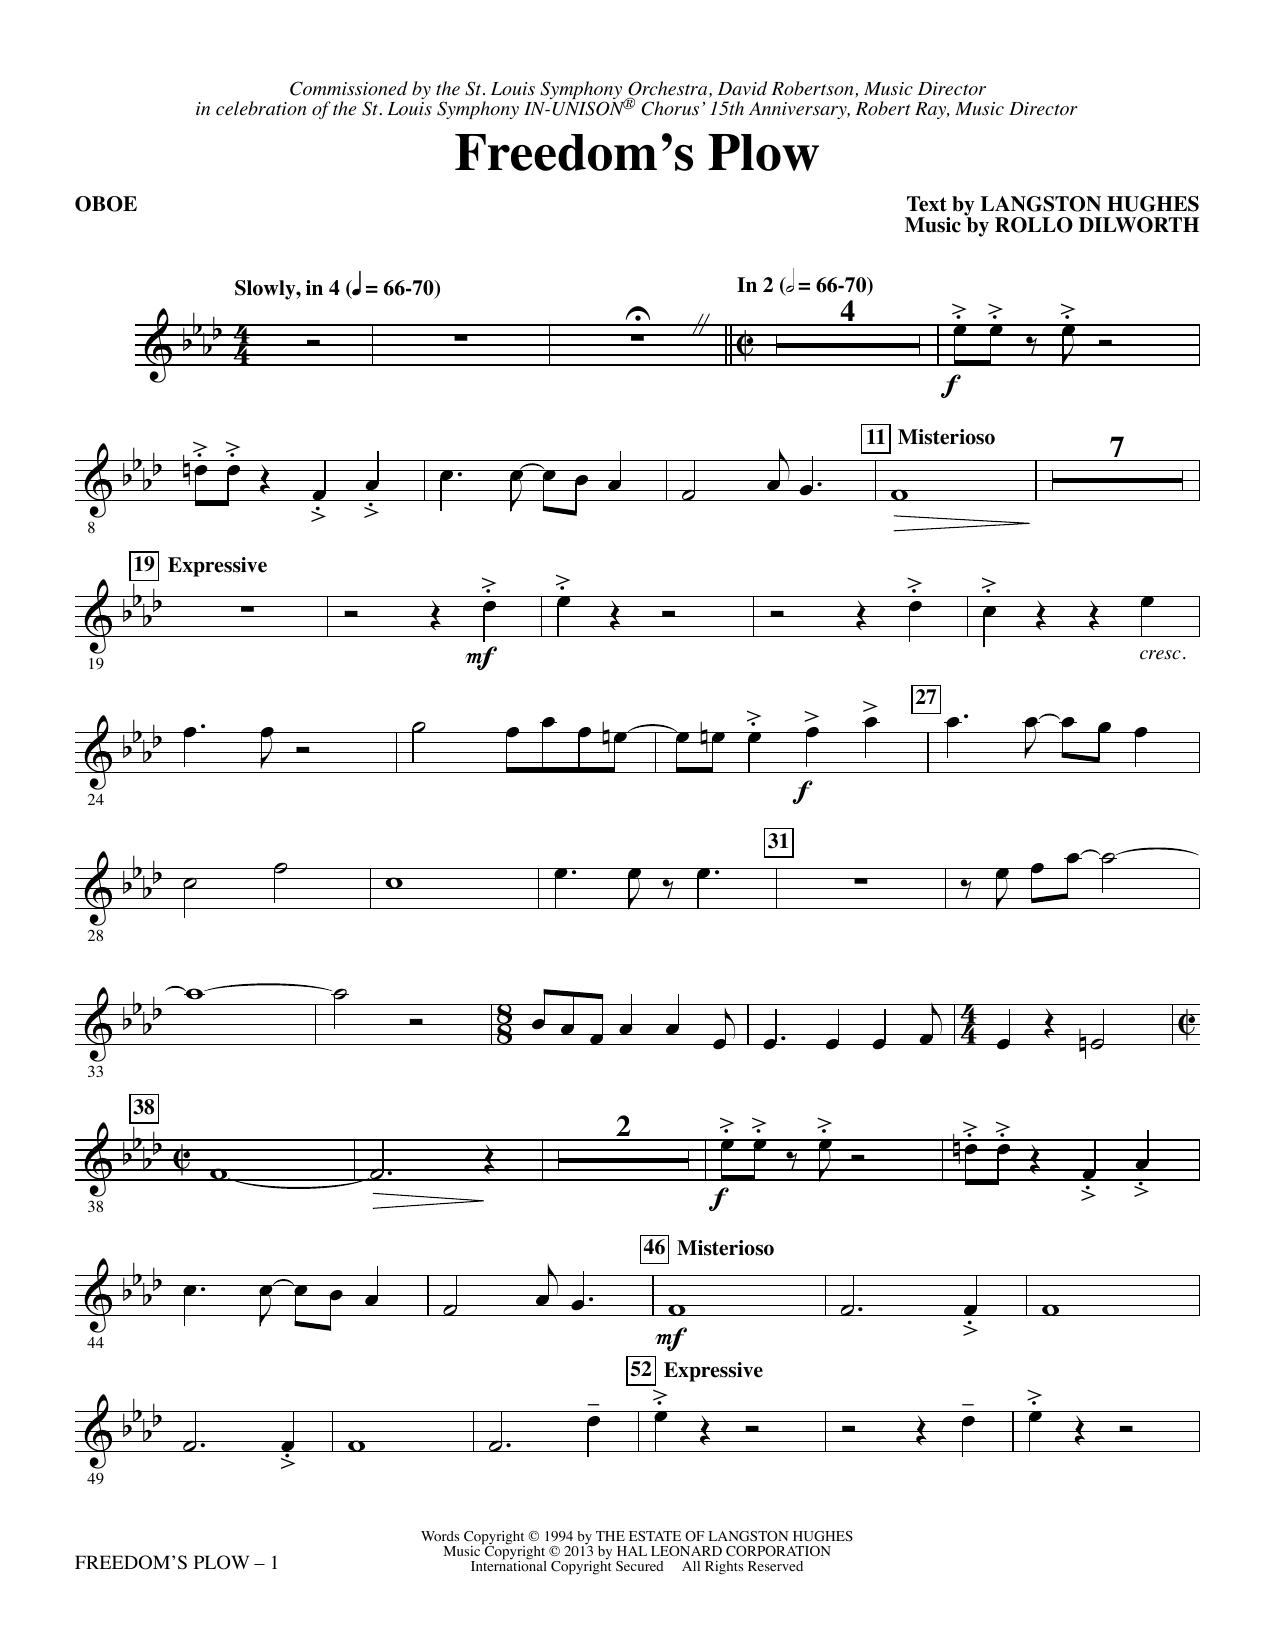 Freedom's Plow - Oboe sheet music